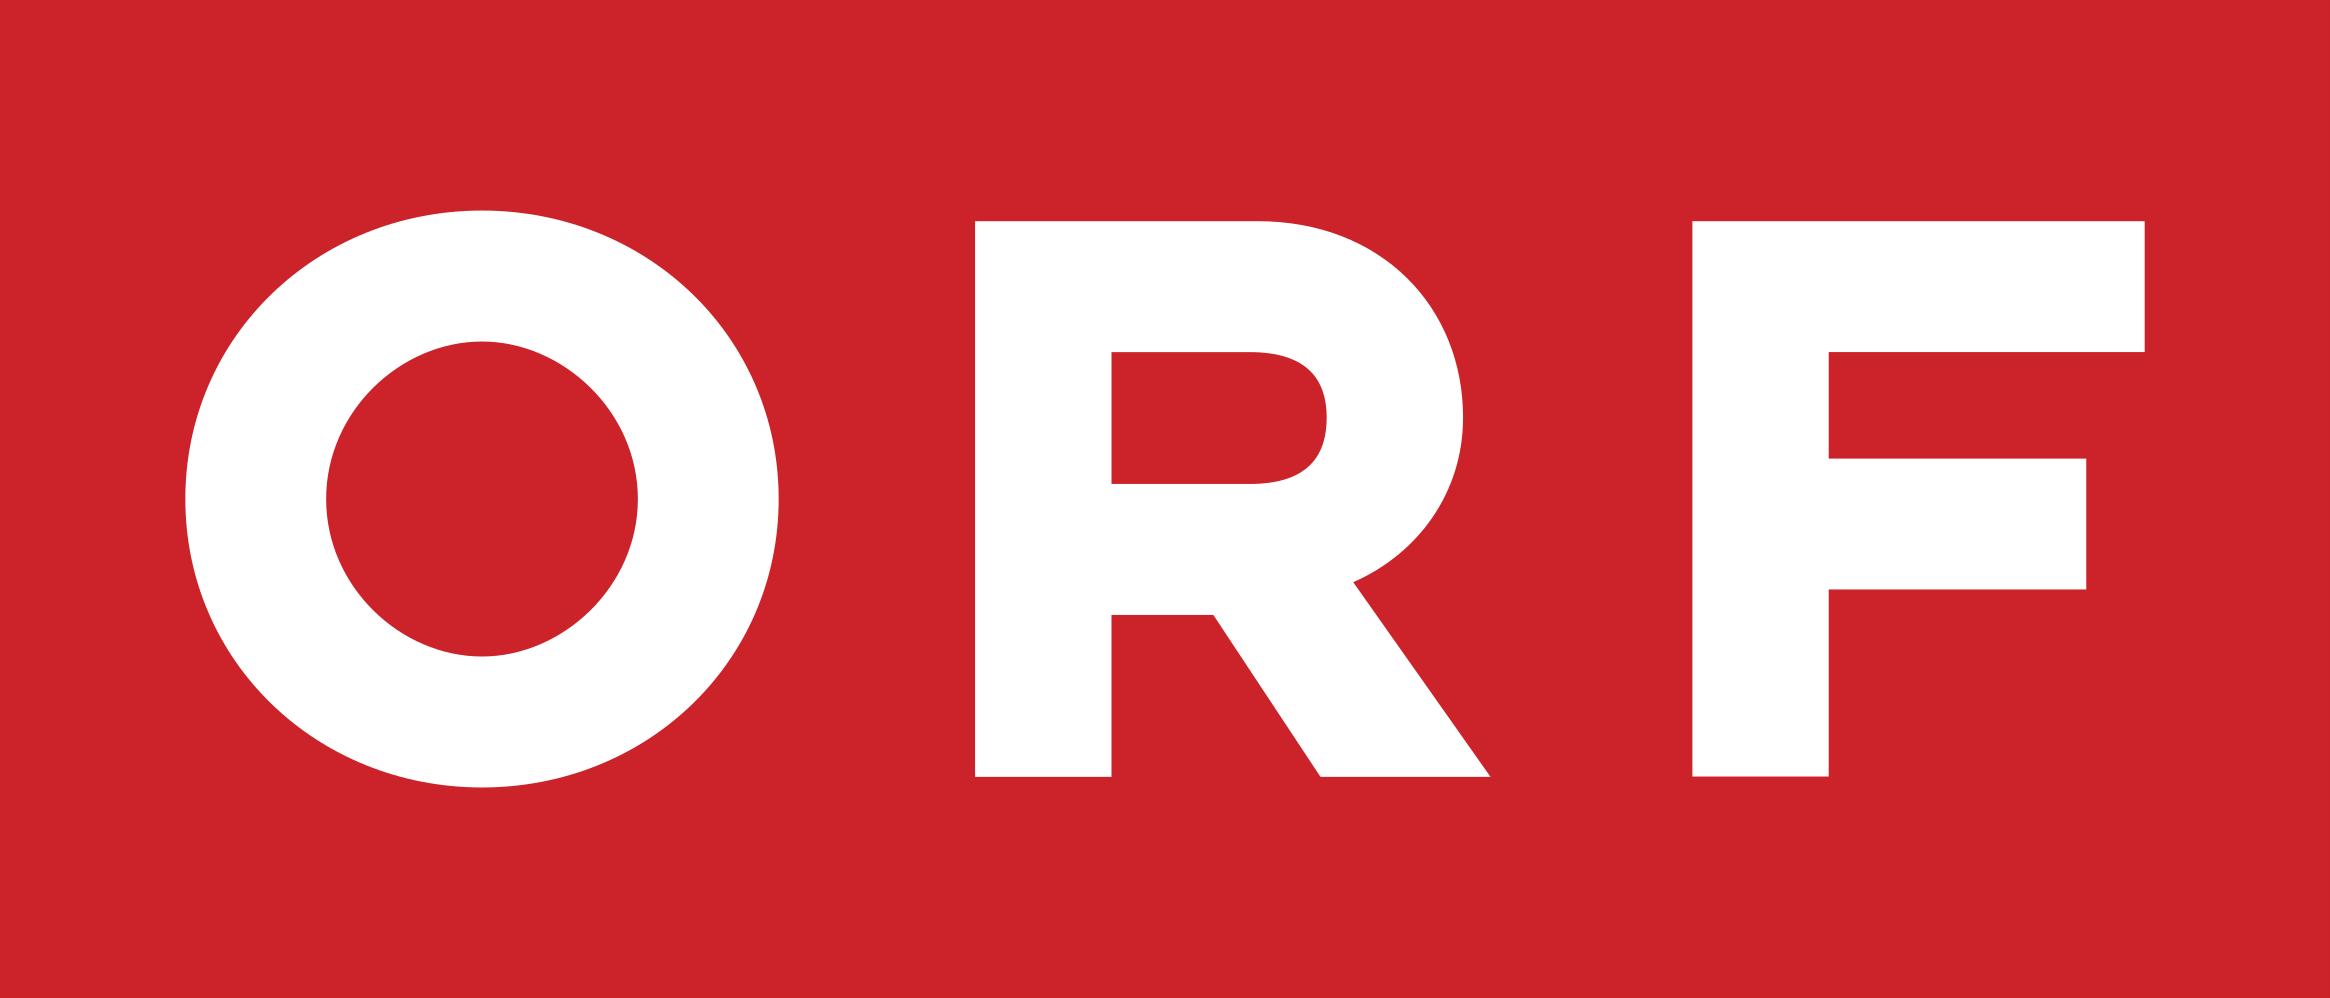 orf-logo-png-transparentpng